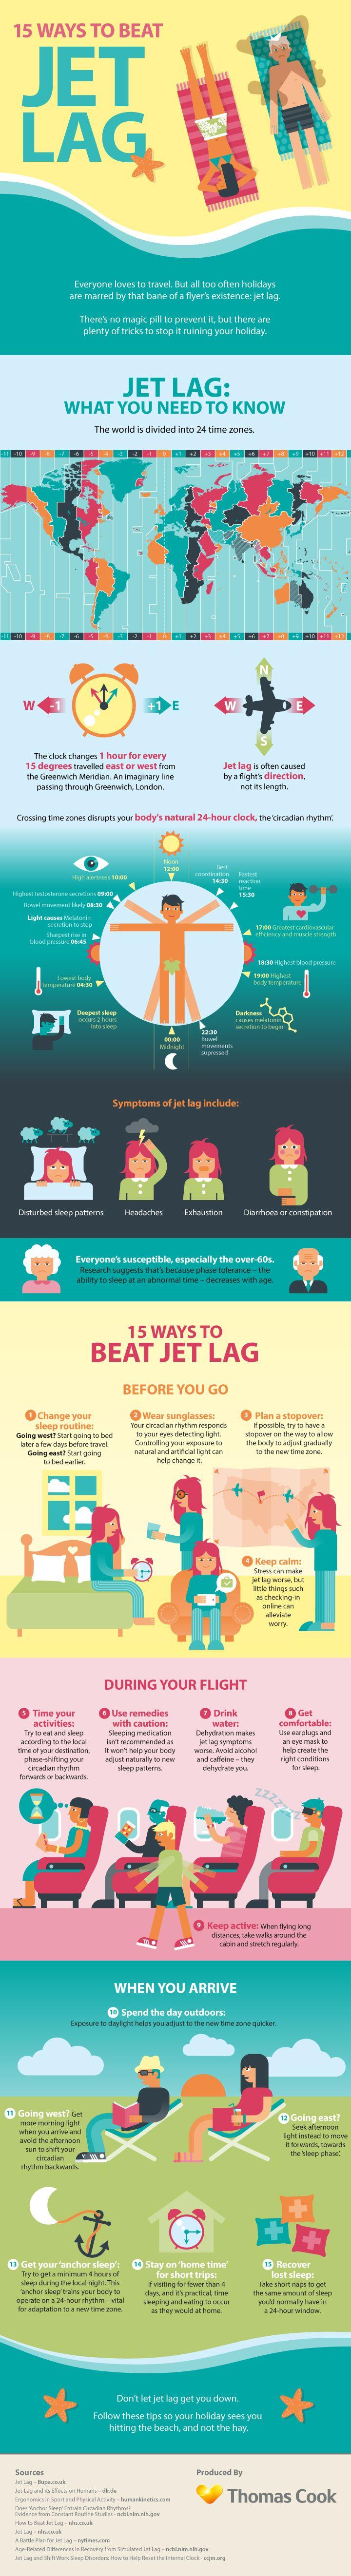 15 Ways to Beat Jet Lag - Travel on Inspiration